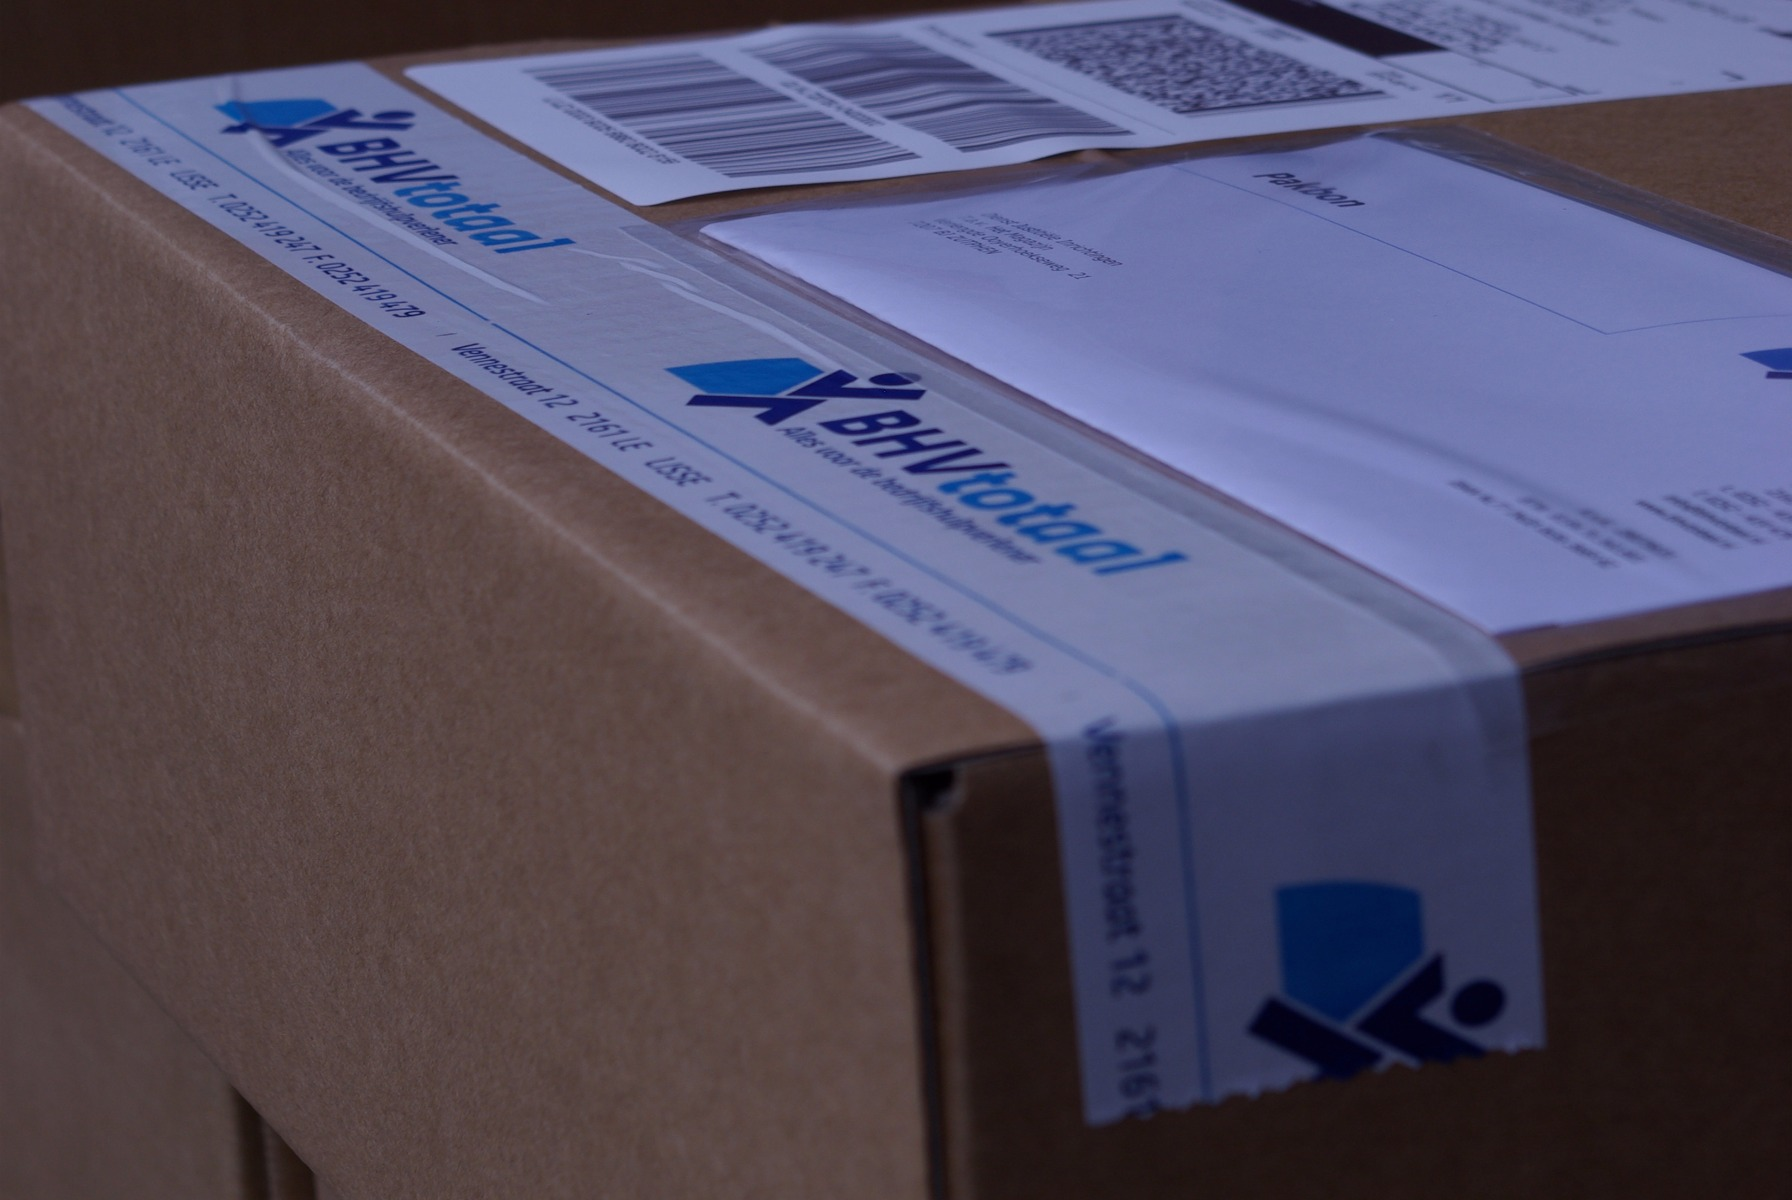 BHVtotaal pakket